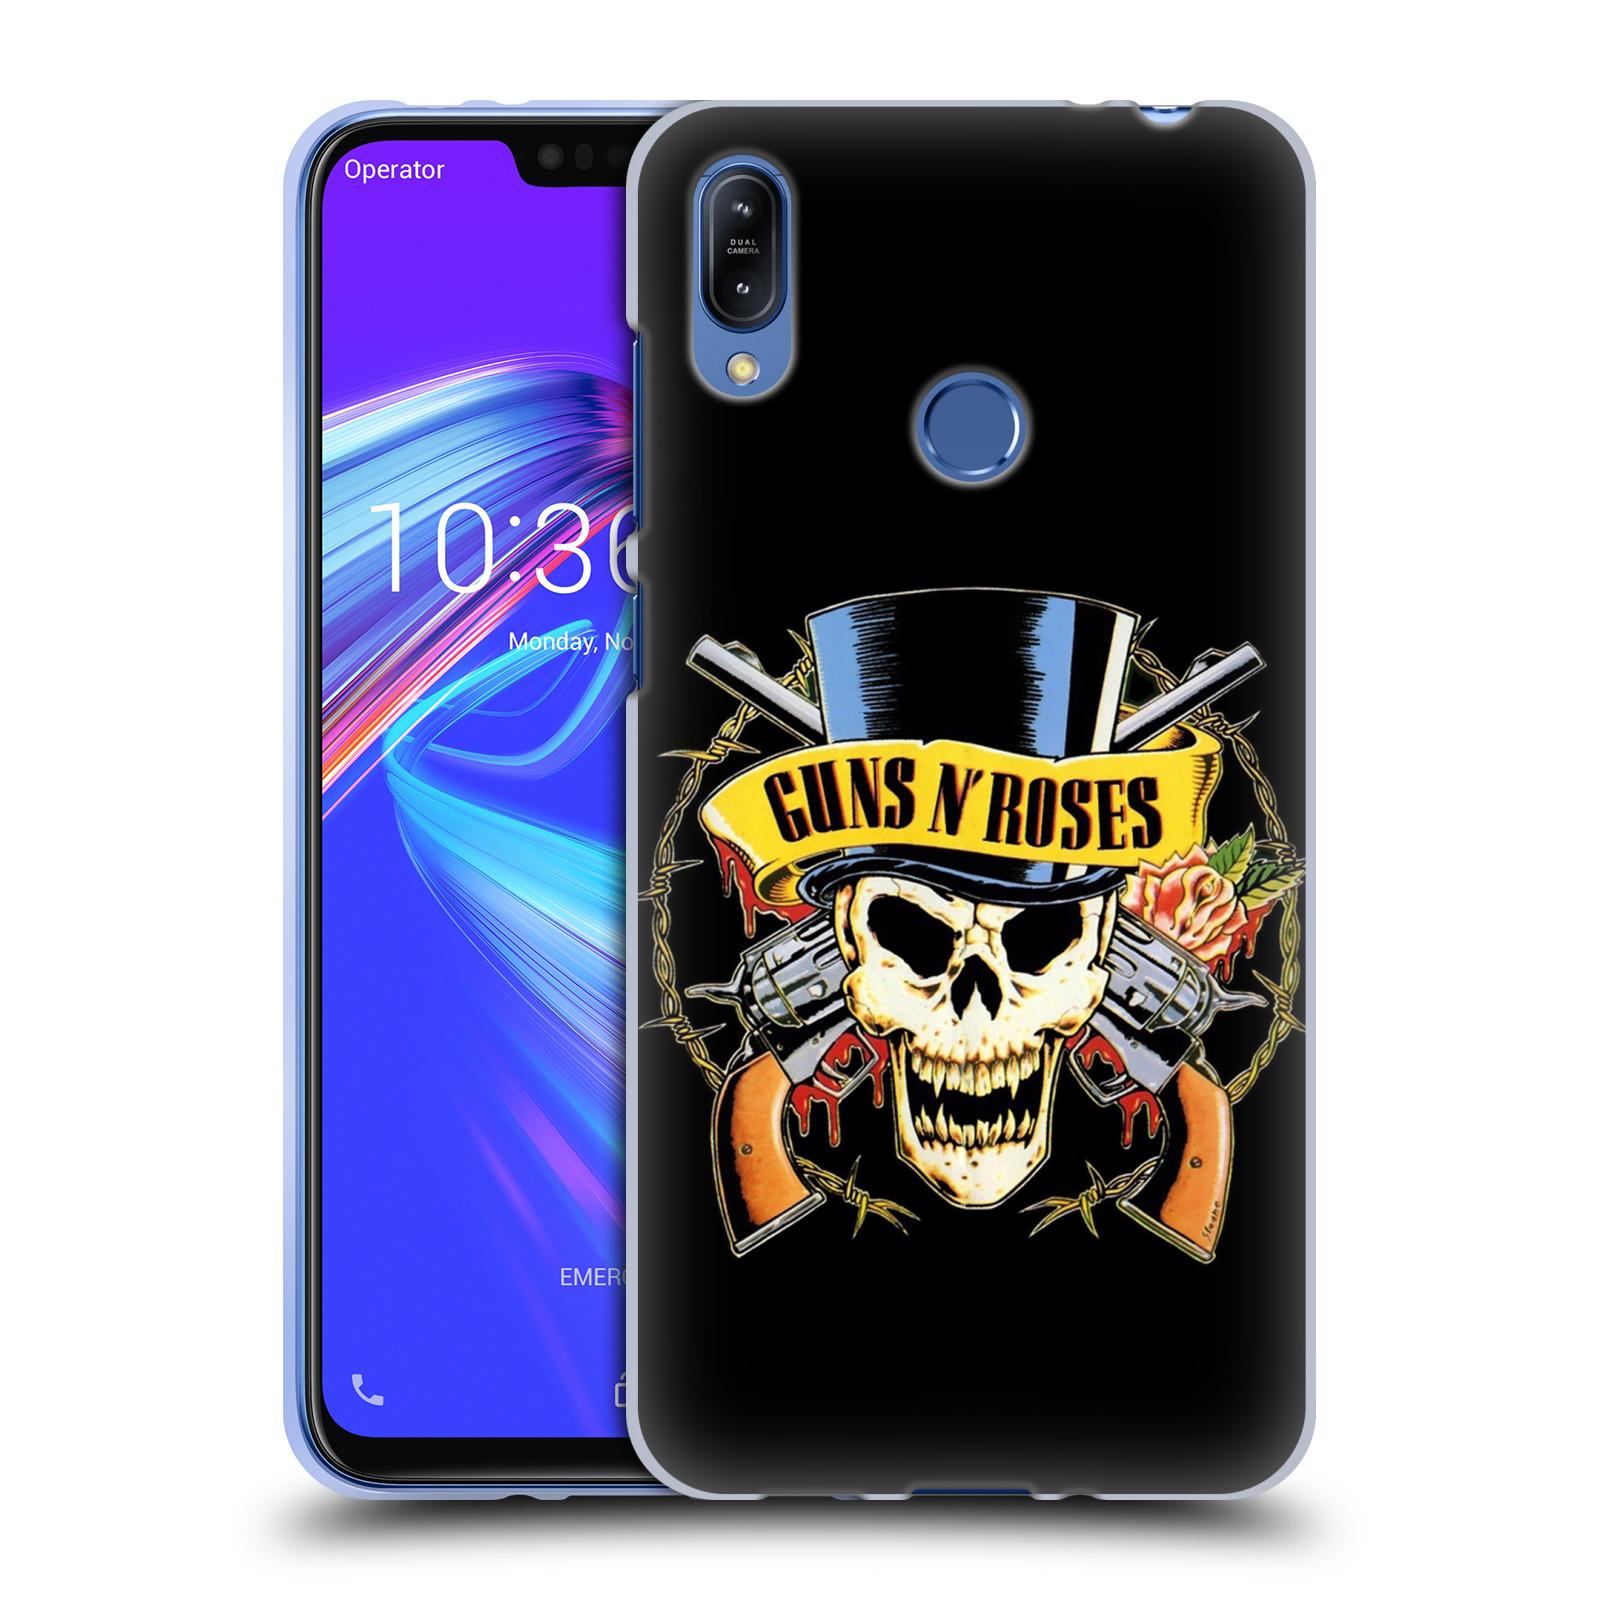 Silikonové pouzdro na mobil Asus Zenfone Max (M2) ZB633KL - Head Case - Guns N' Roses - Lebka